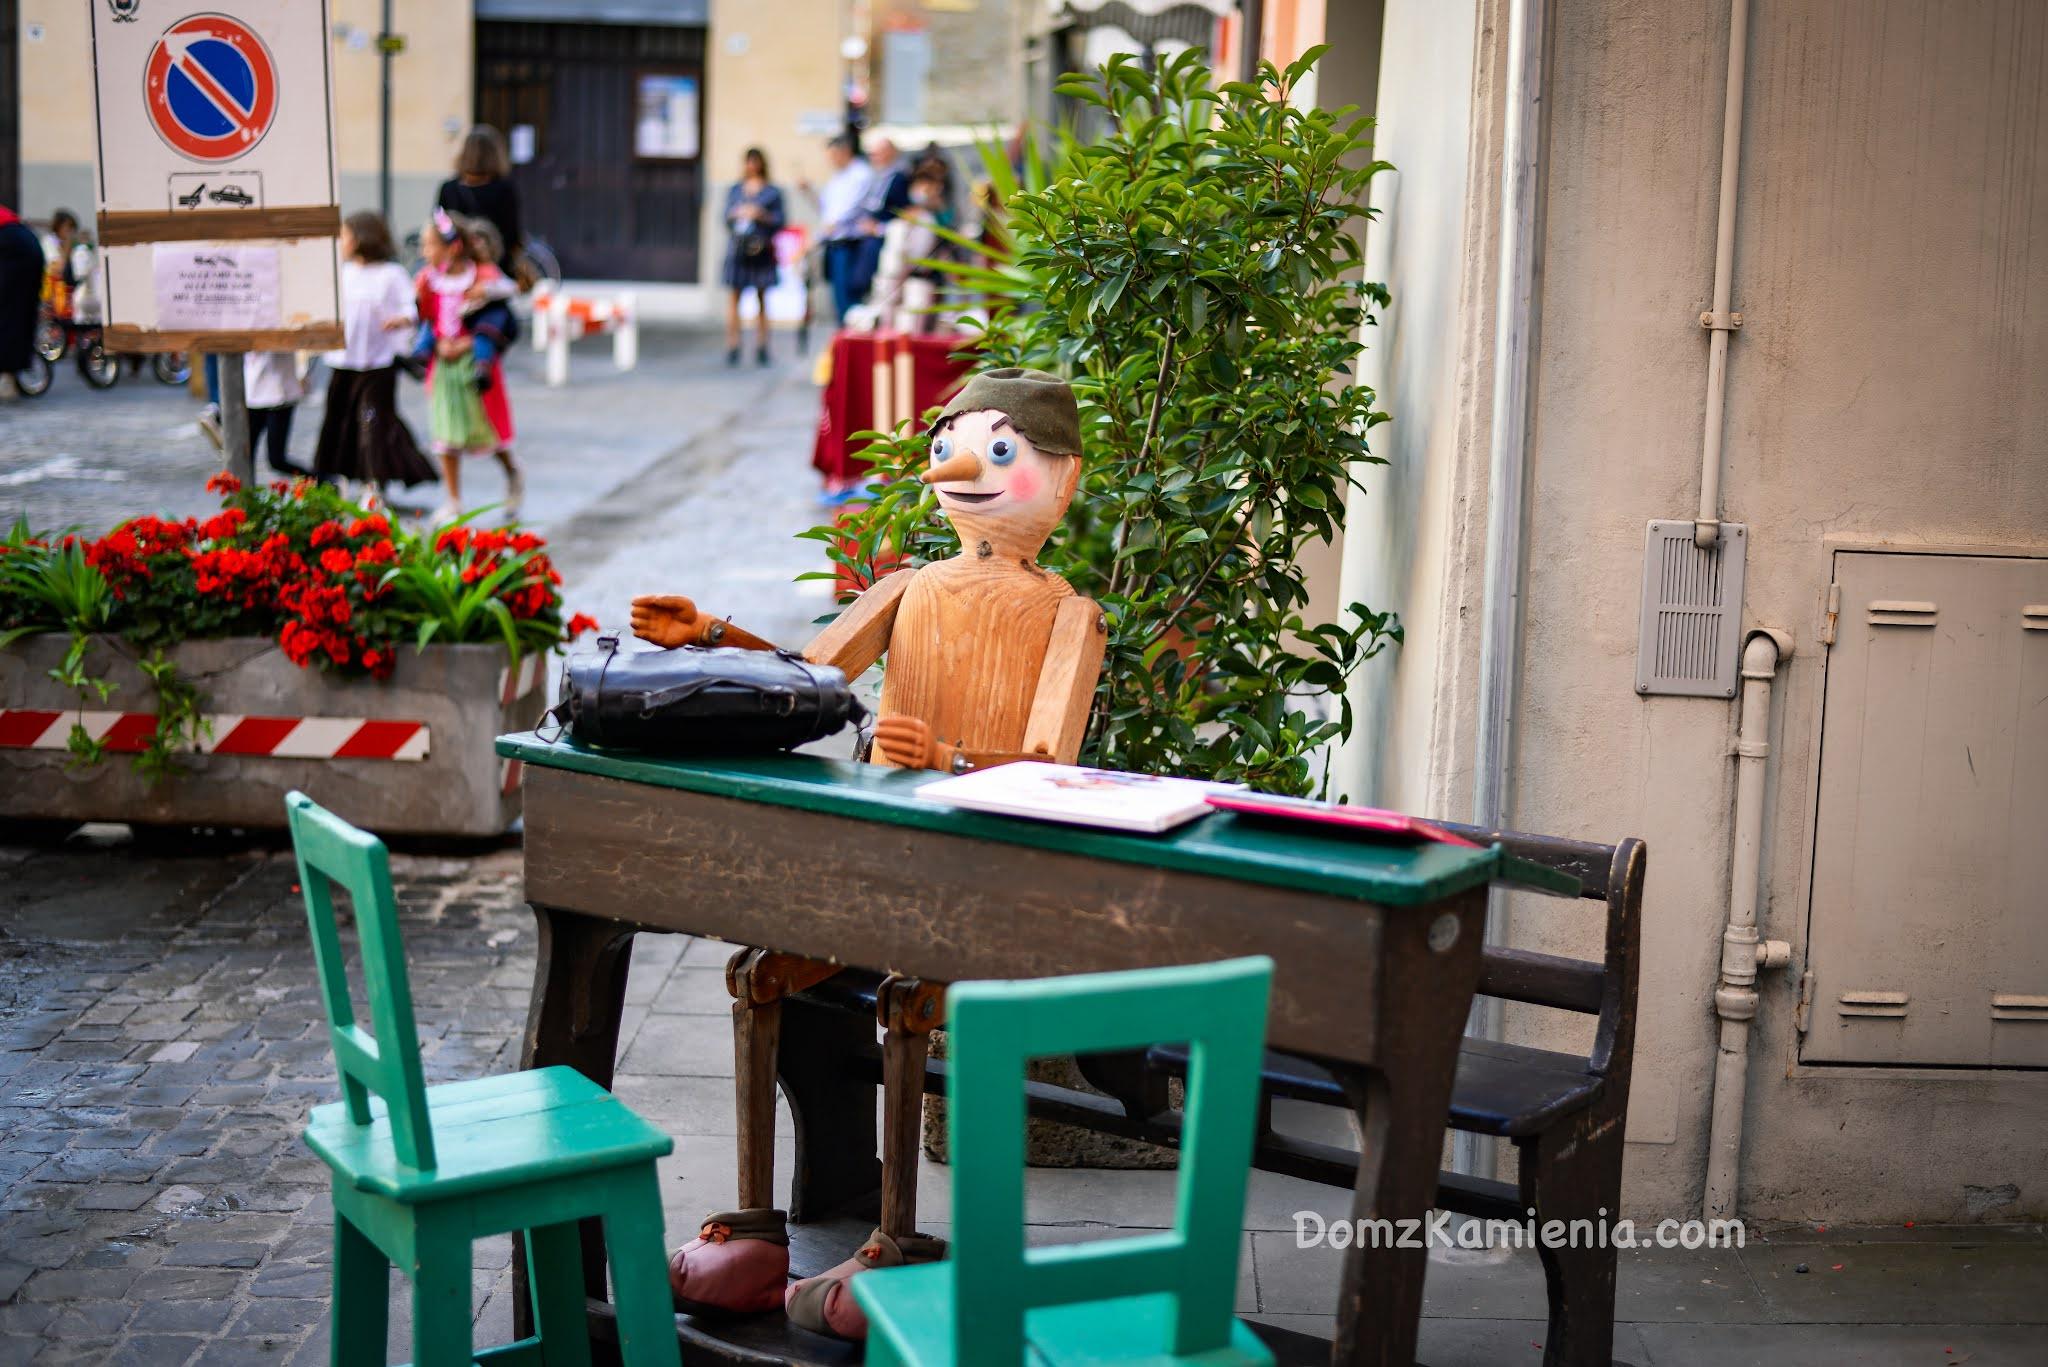 Feste dell'Ottocento Modigliana 2021, Dom z Kamienia blog